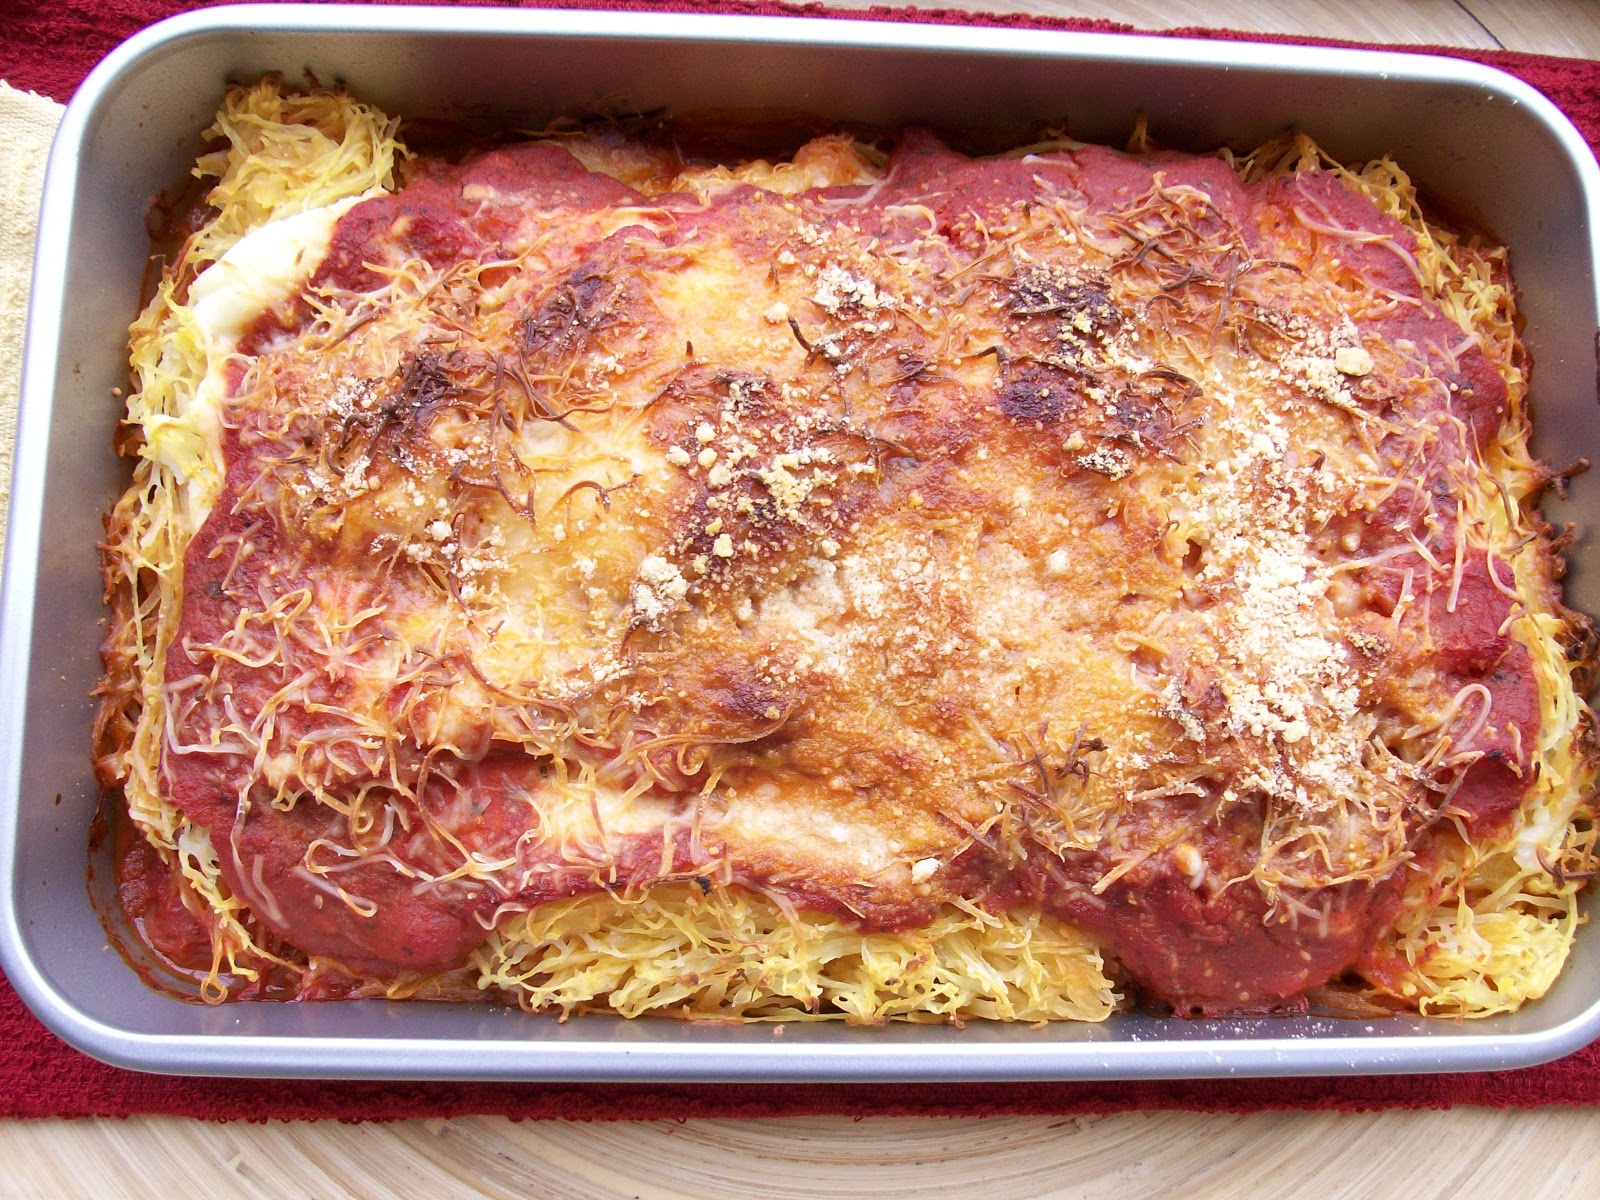 ... Street Health and Wellness: What's New: Spaghetti Squash Lasagna